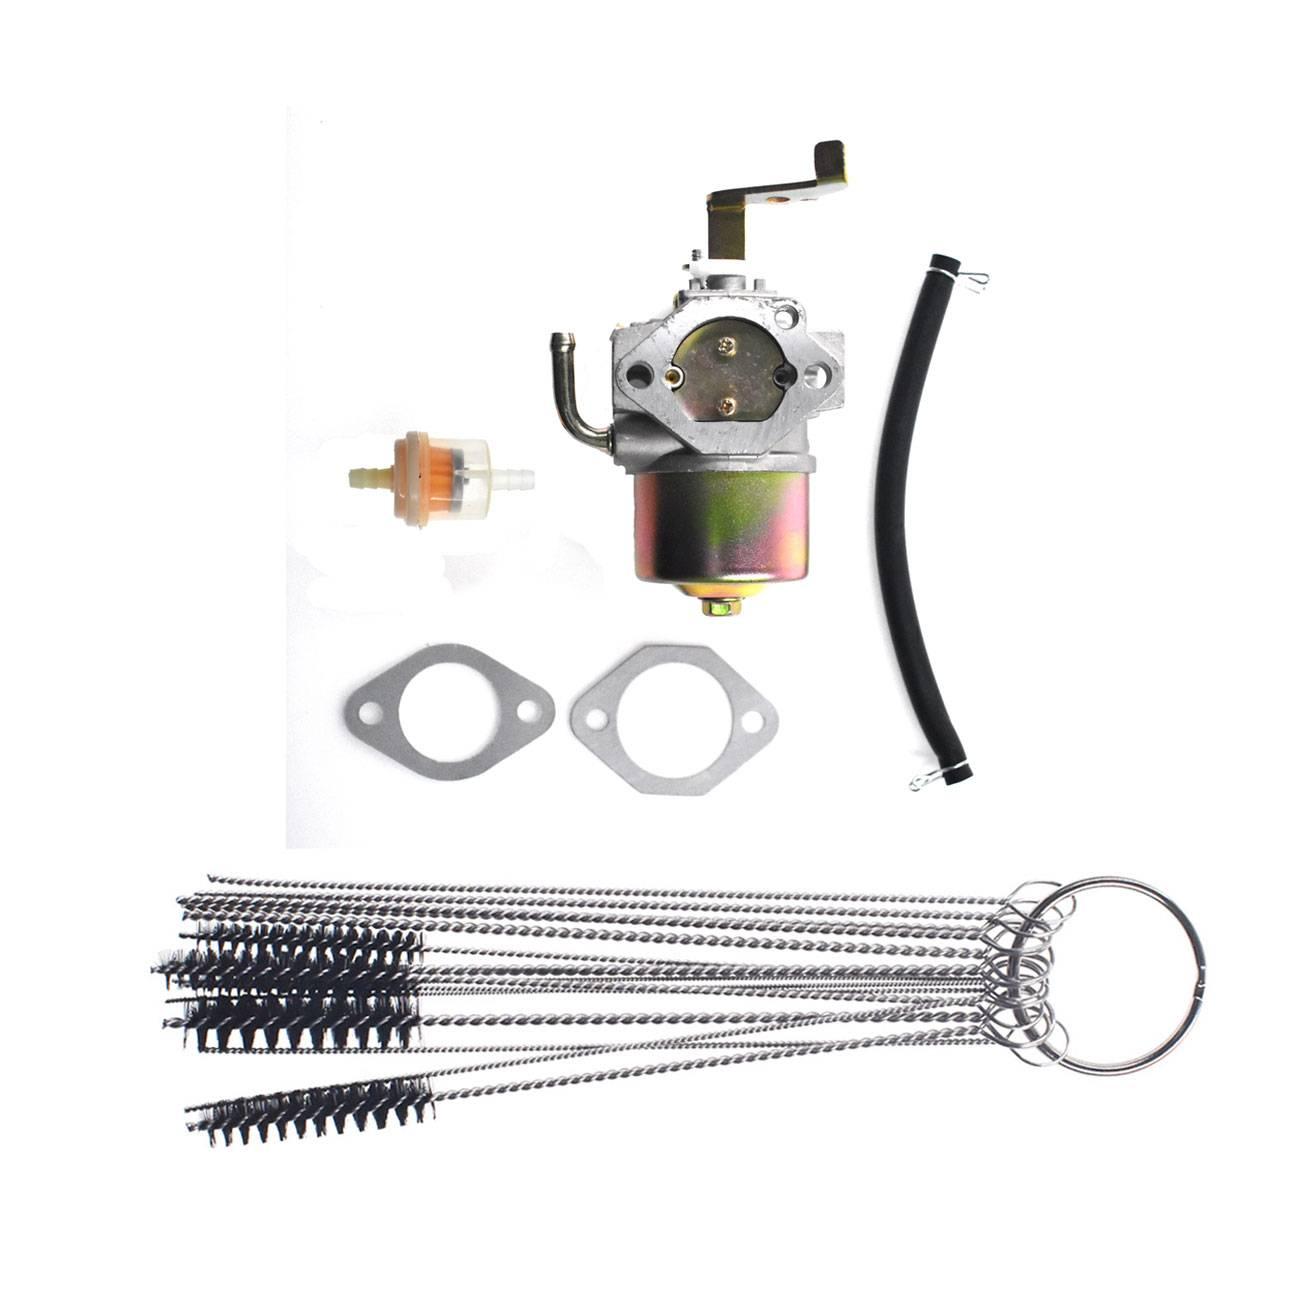 Carburetor Cleaning Brush gasket air filter For Subaru Robin EY28 EY 28 Generator RGX3500 RGX3510